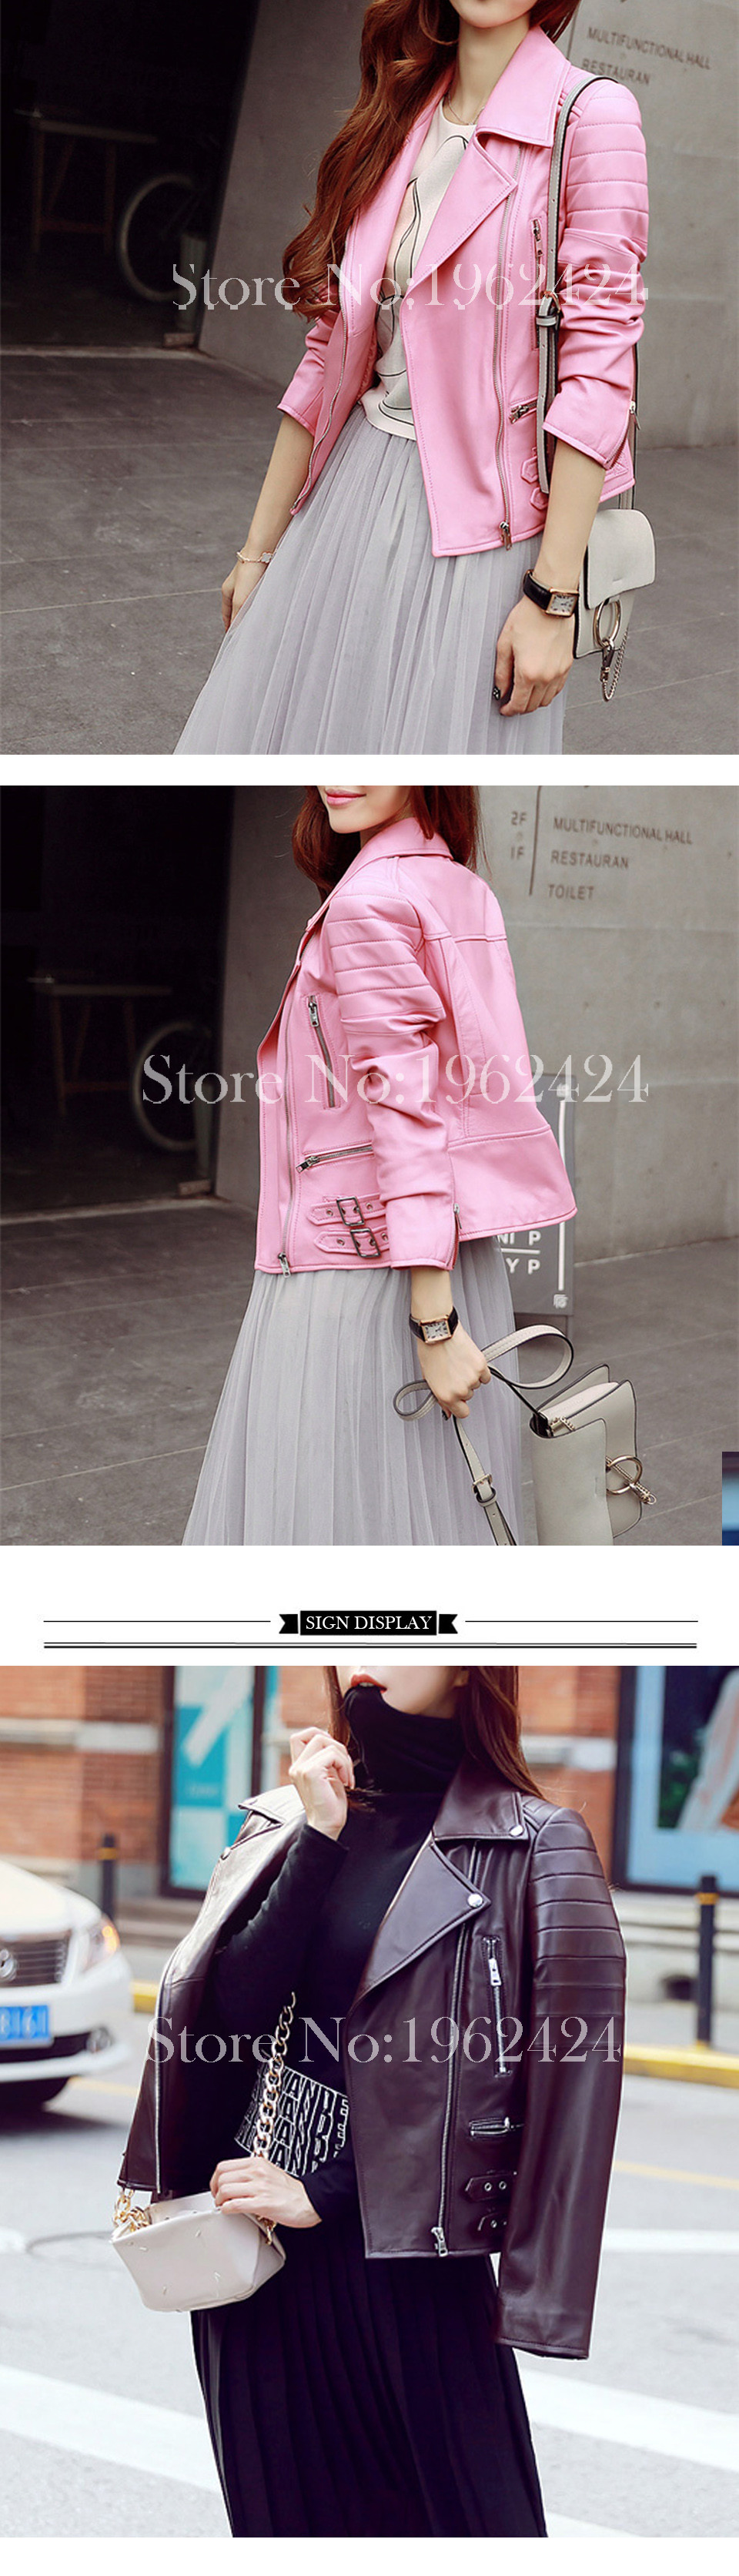 HOT Free shipping 2016 new autumn fashion women high quality sheep skin leather motorcycle jacket lapel Slim rivet & XXL & Pink